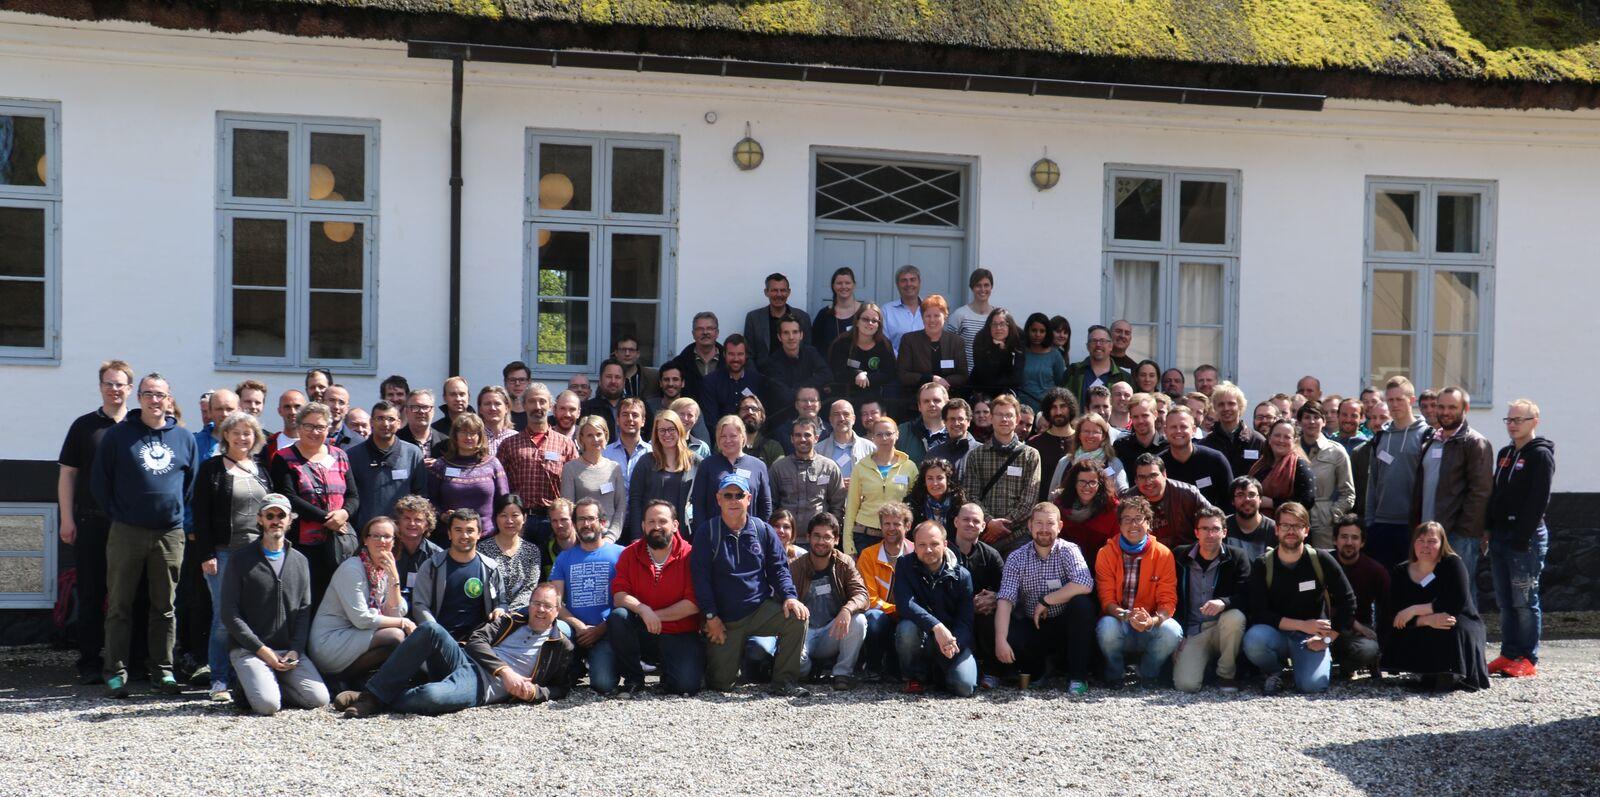 2015 QGIS Conference in Nødebo Denmark